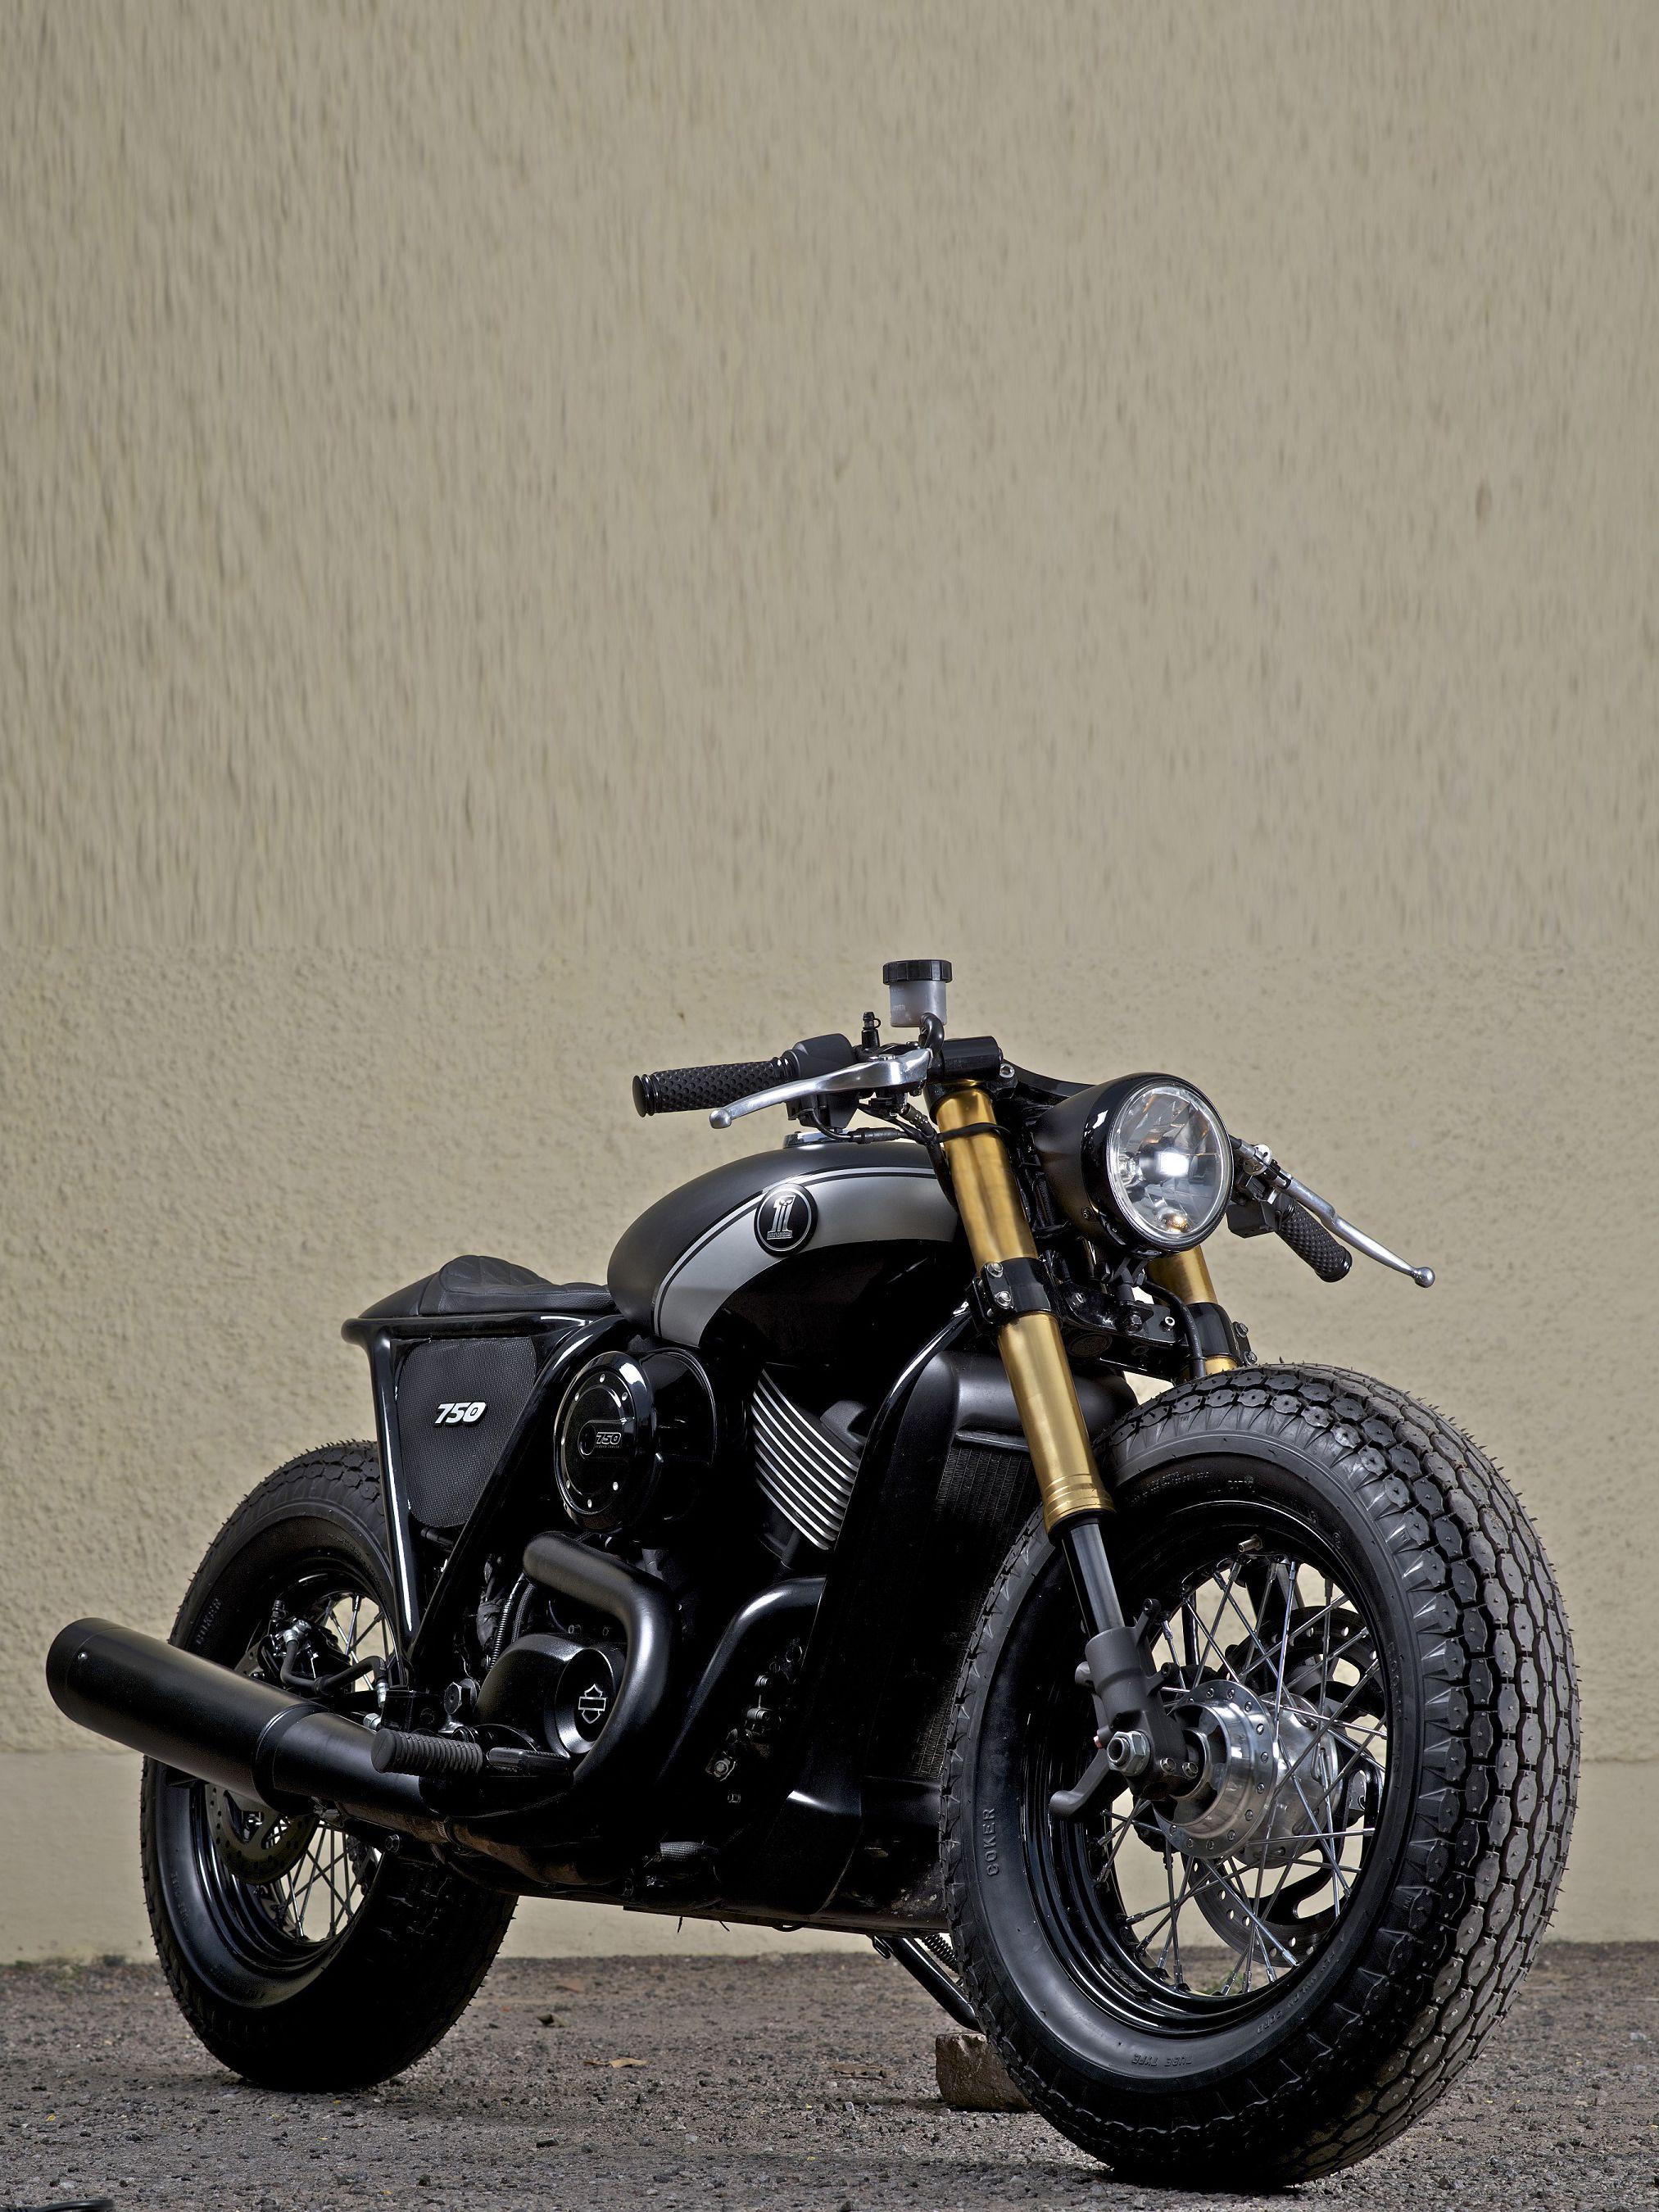 Harley Davidson Goes Electric With Livewire Cafe Racer Car And Motorcycle Design Harley Davidson